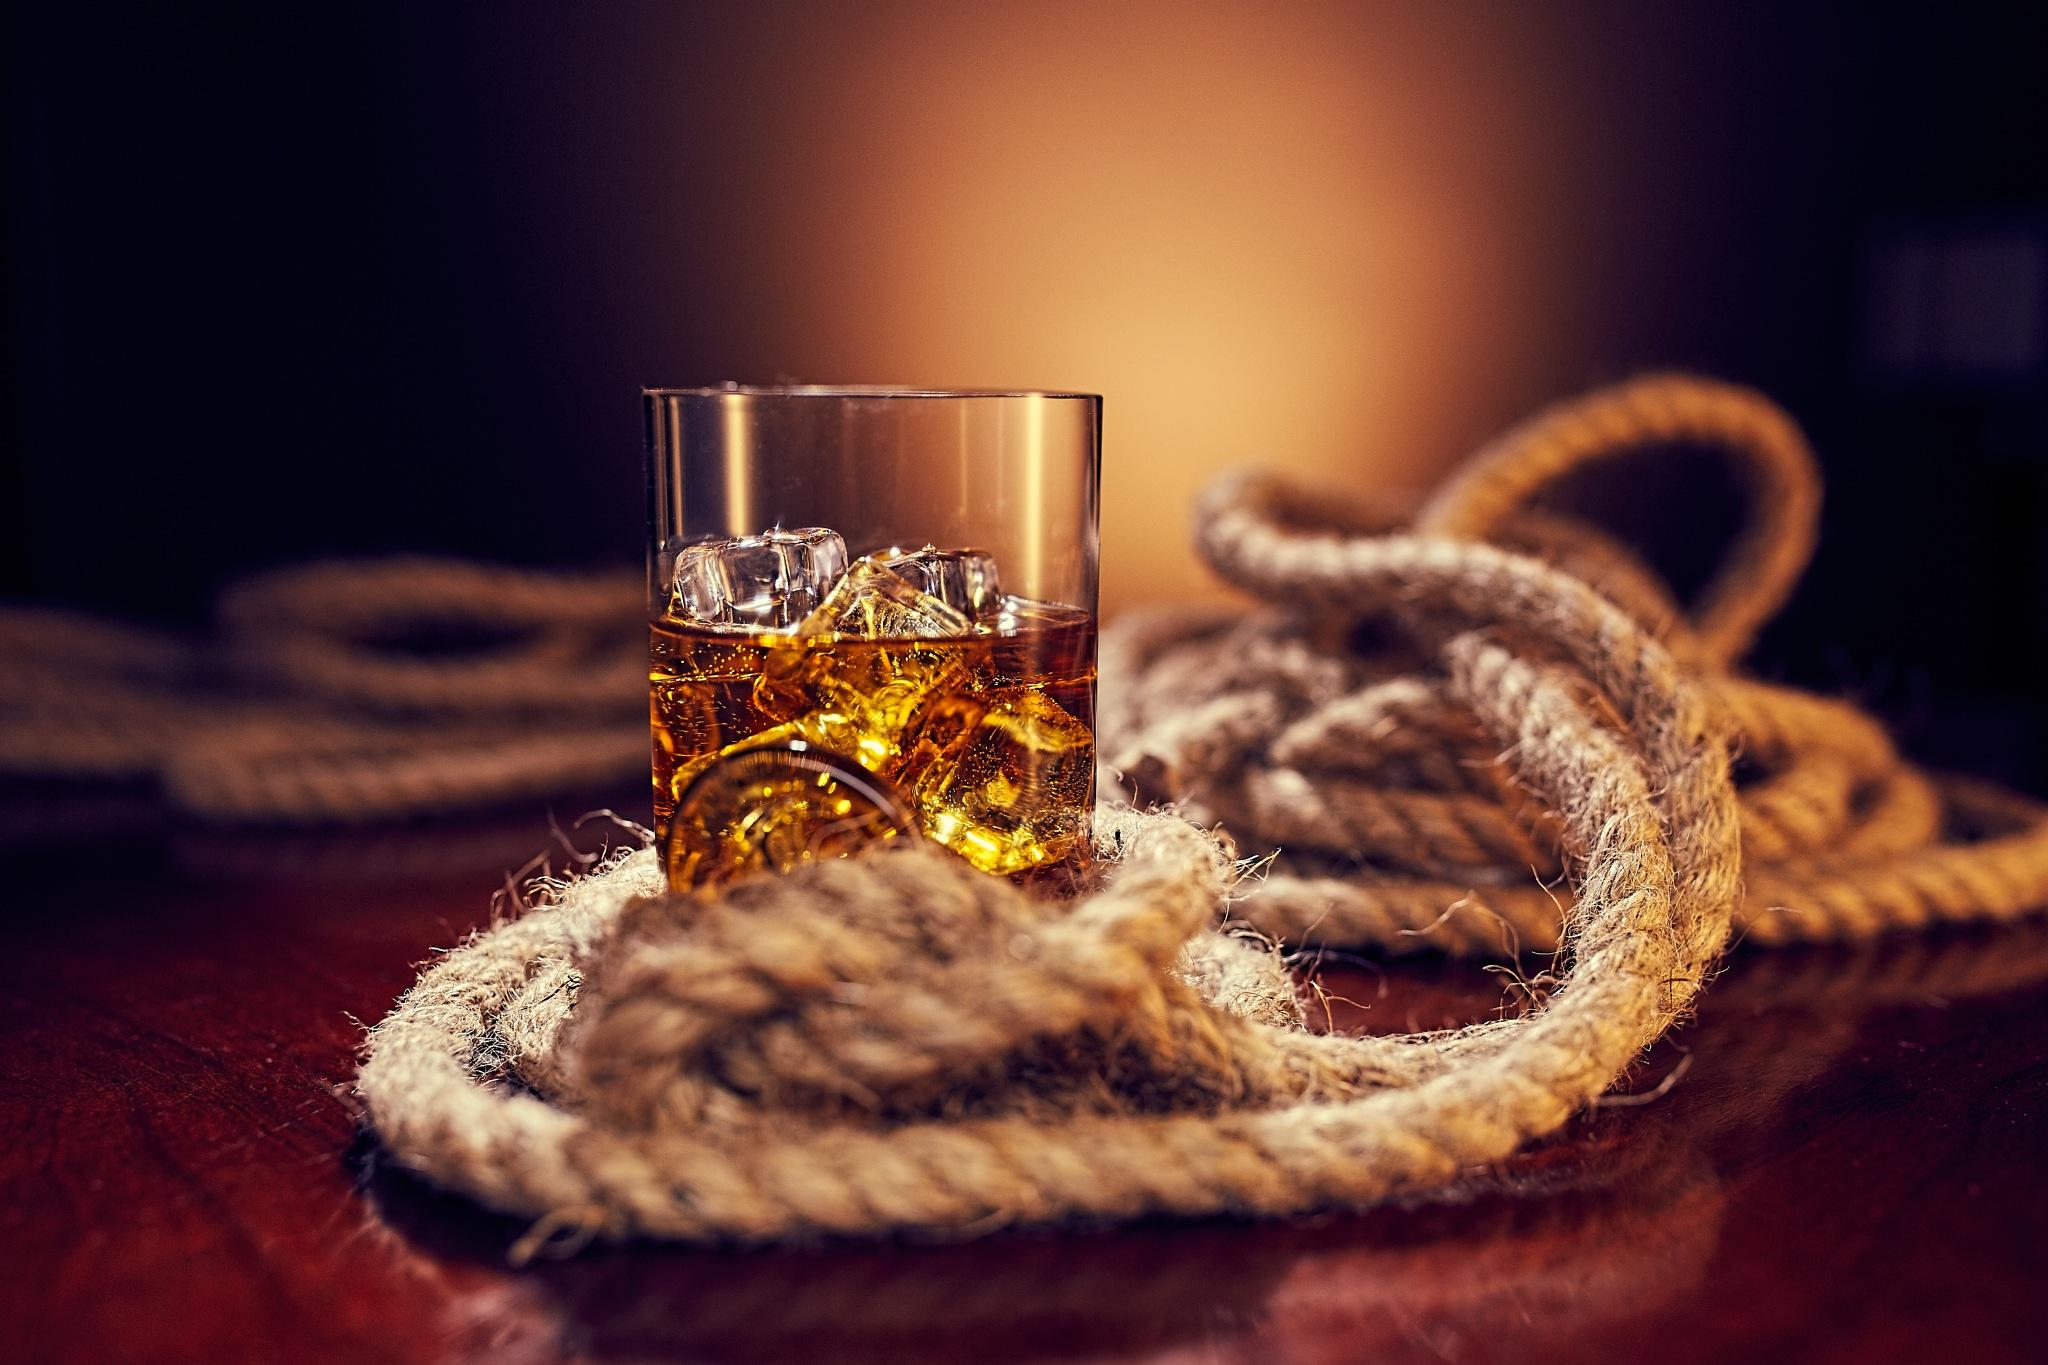 Whiskey by Roberto_69